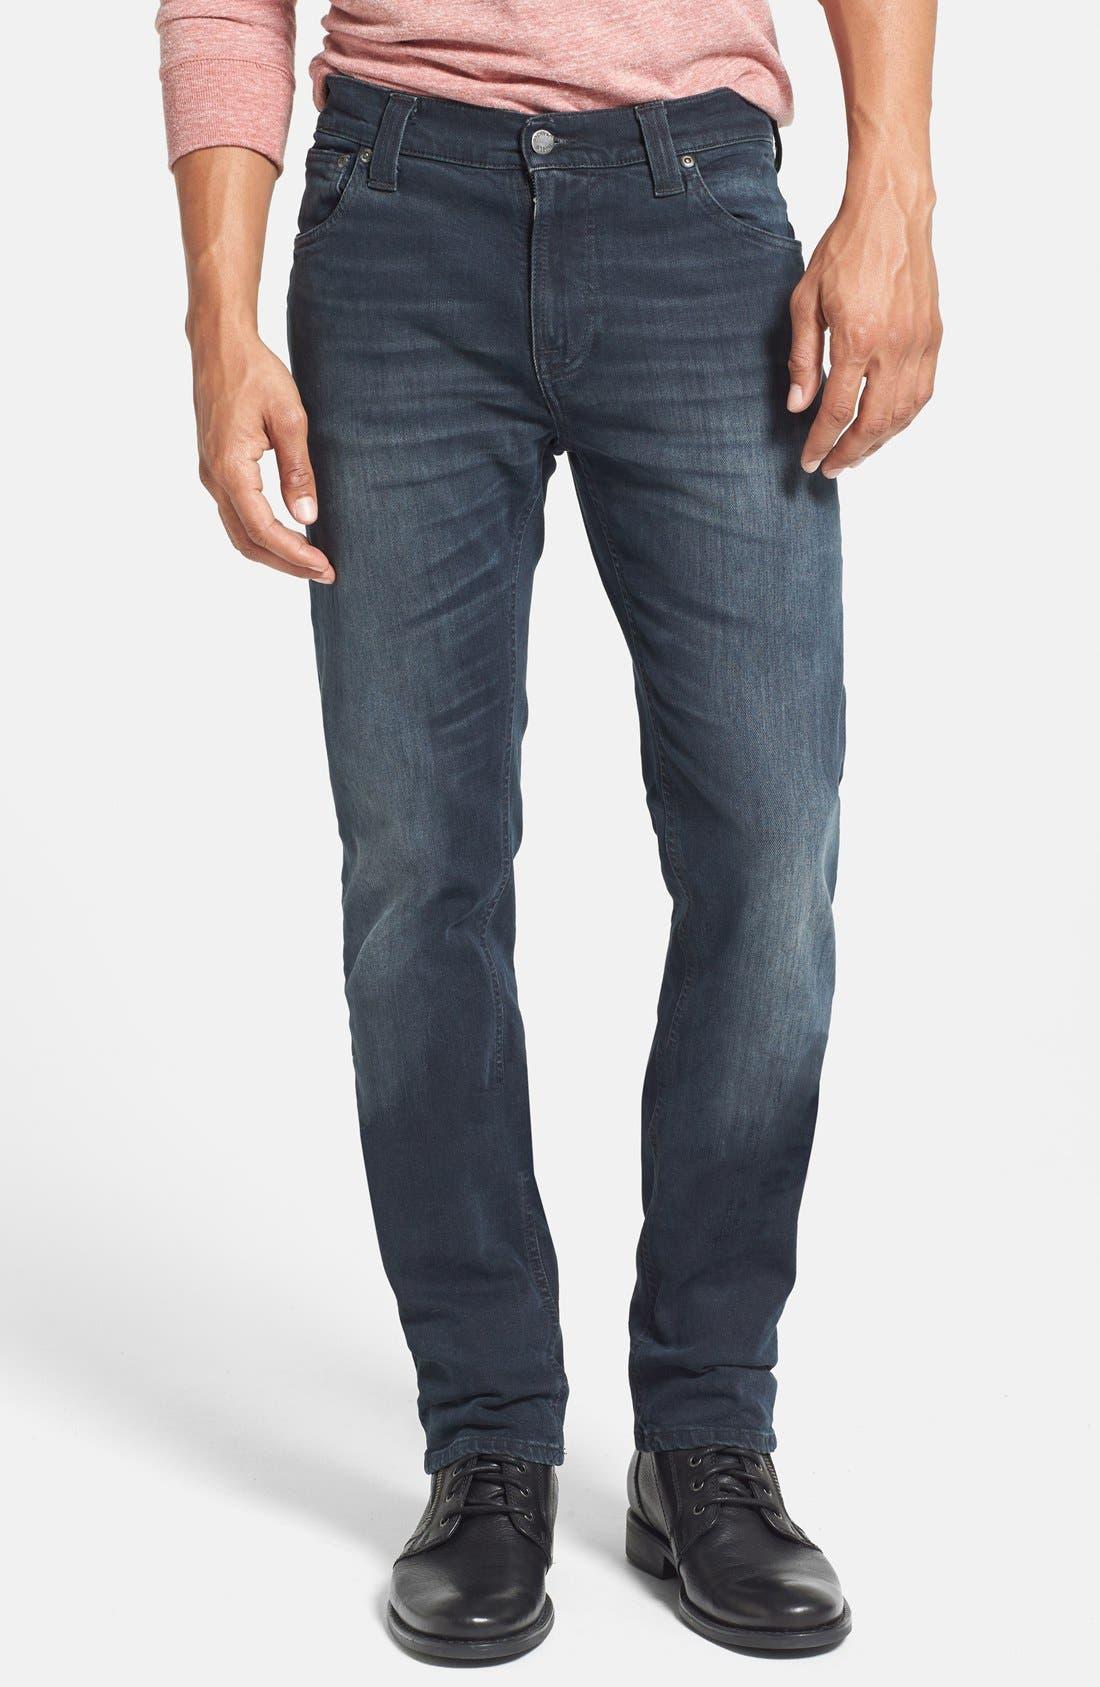 Alternate Image 1 Selected - Nudie Jeans 'Thin Finn' Skinny Fit Jeans (Organic Black Grey)